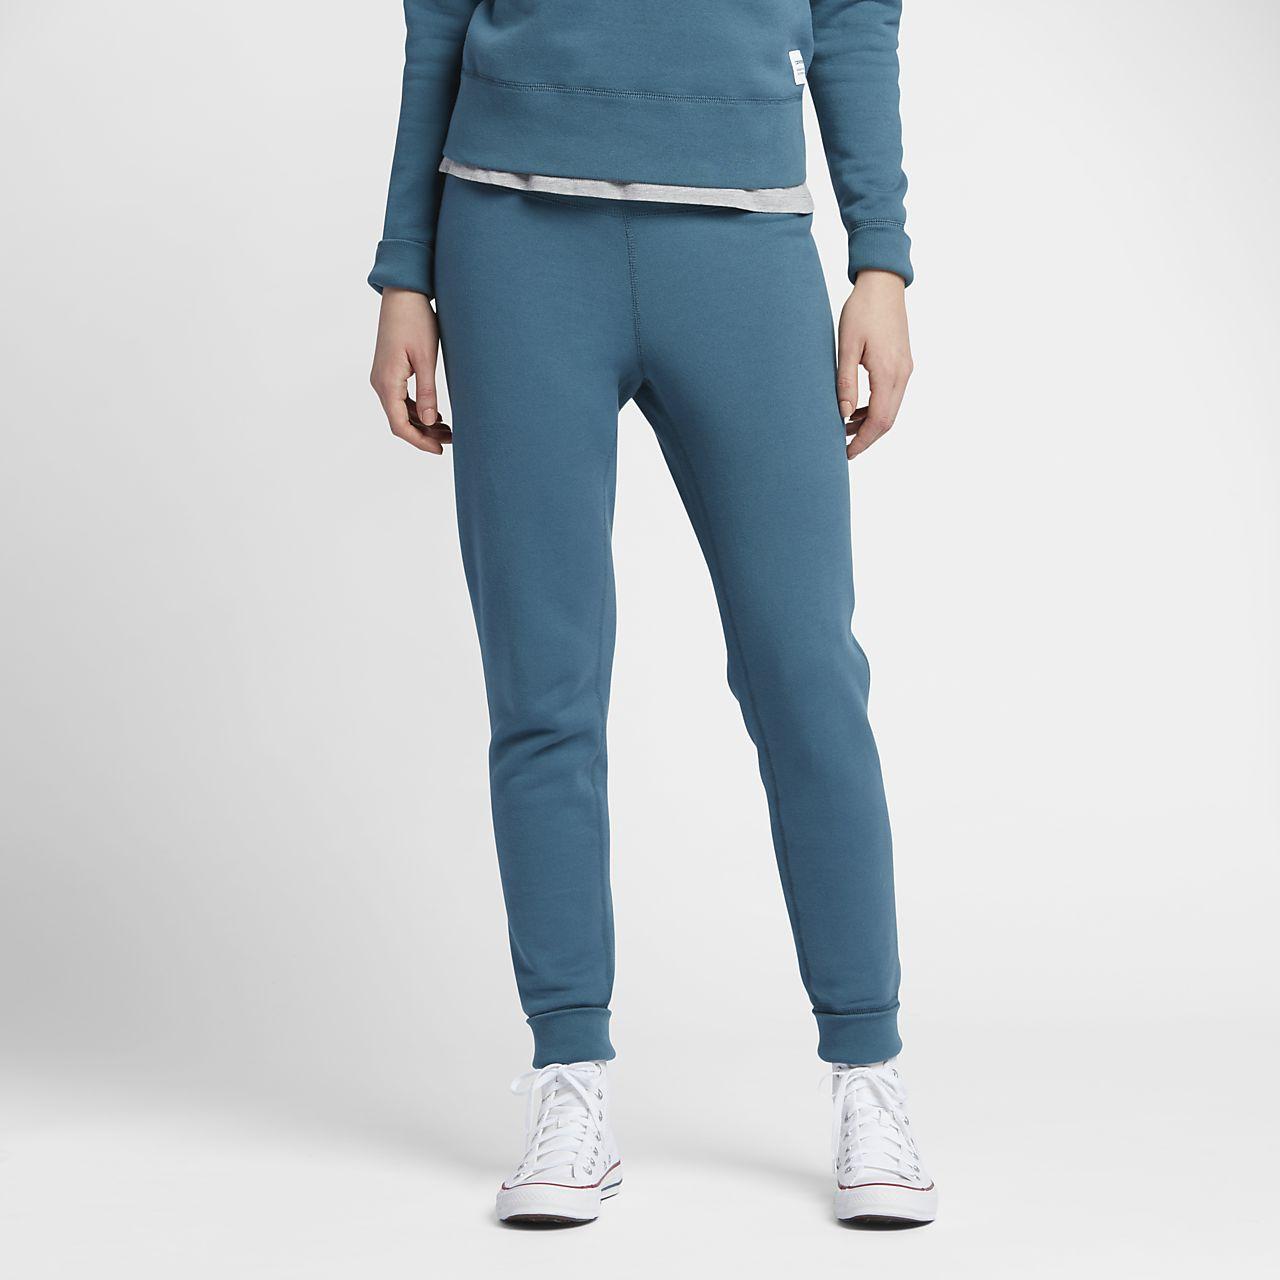 womens sweatpants low resolution converse essentials sportswear womenu0027s sweatpants converse  essentials sportswear womenu0027s sweatpants ktdivnn